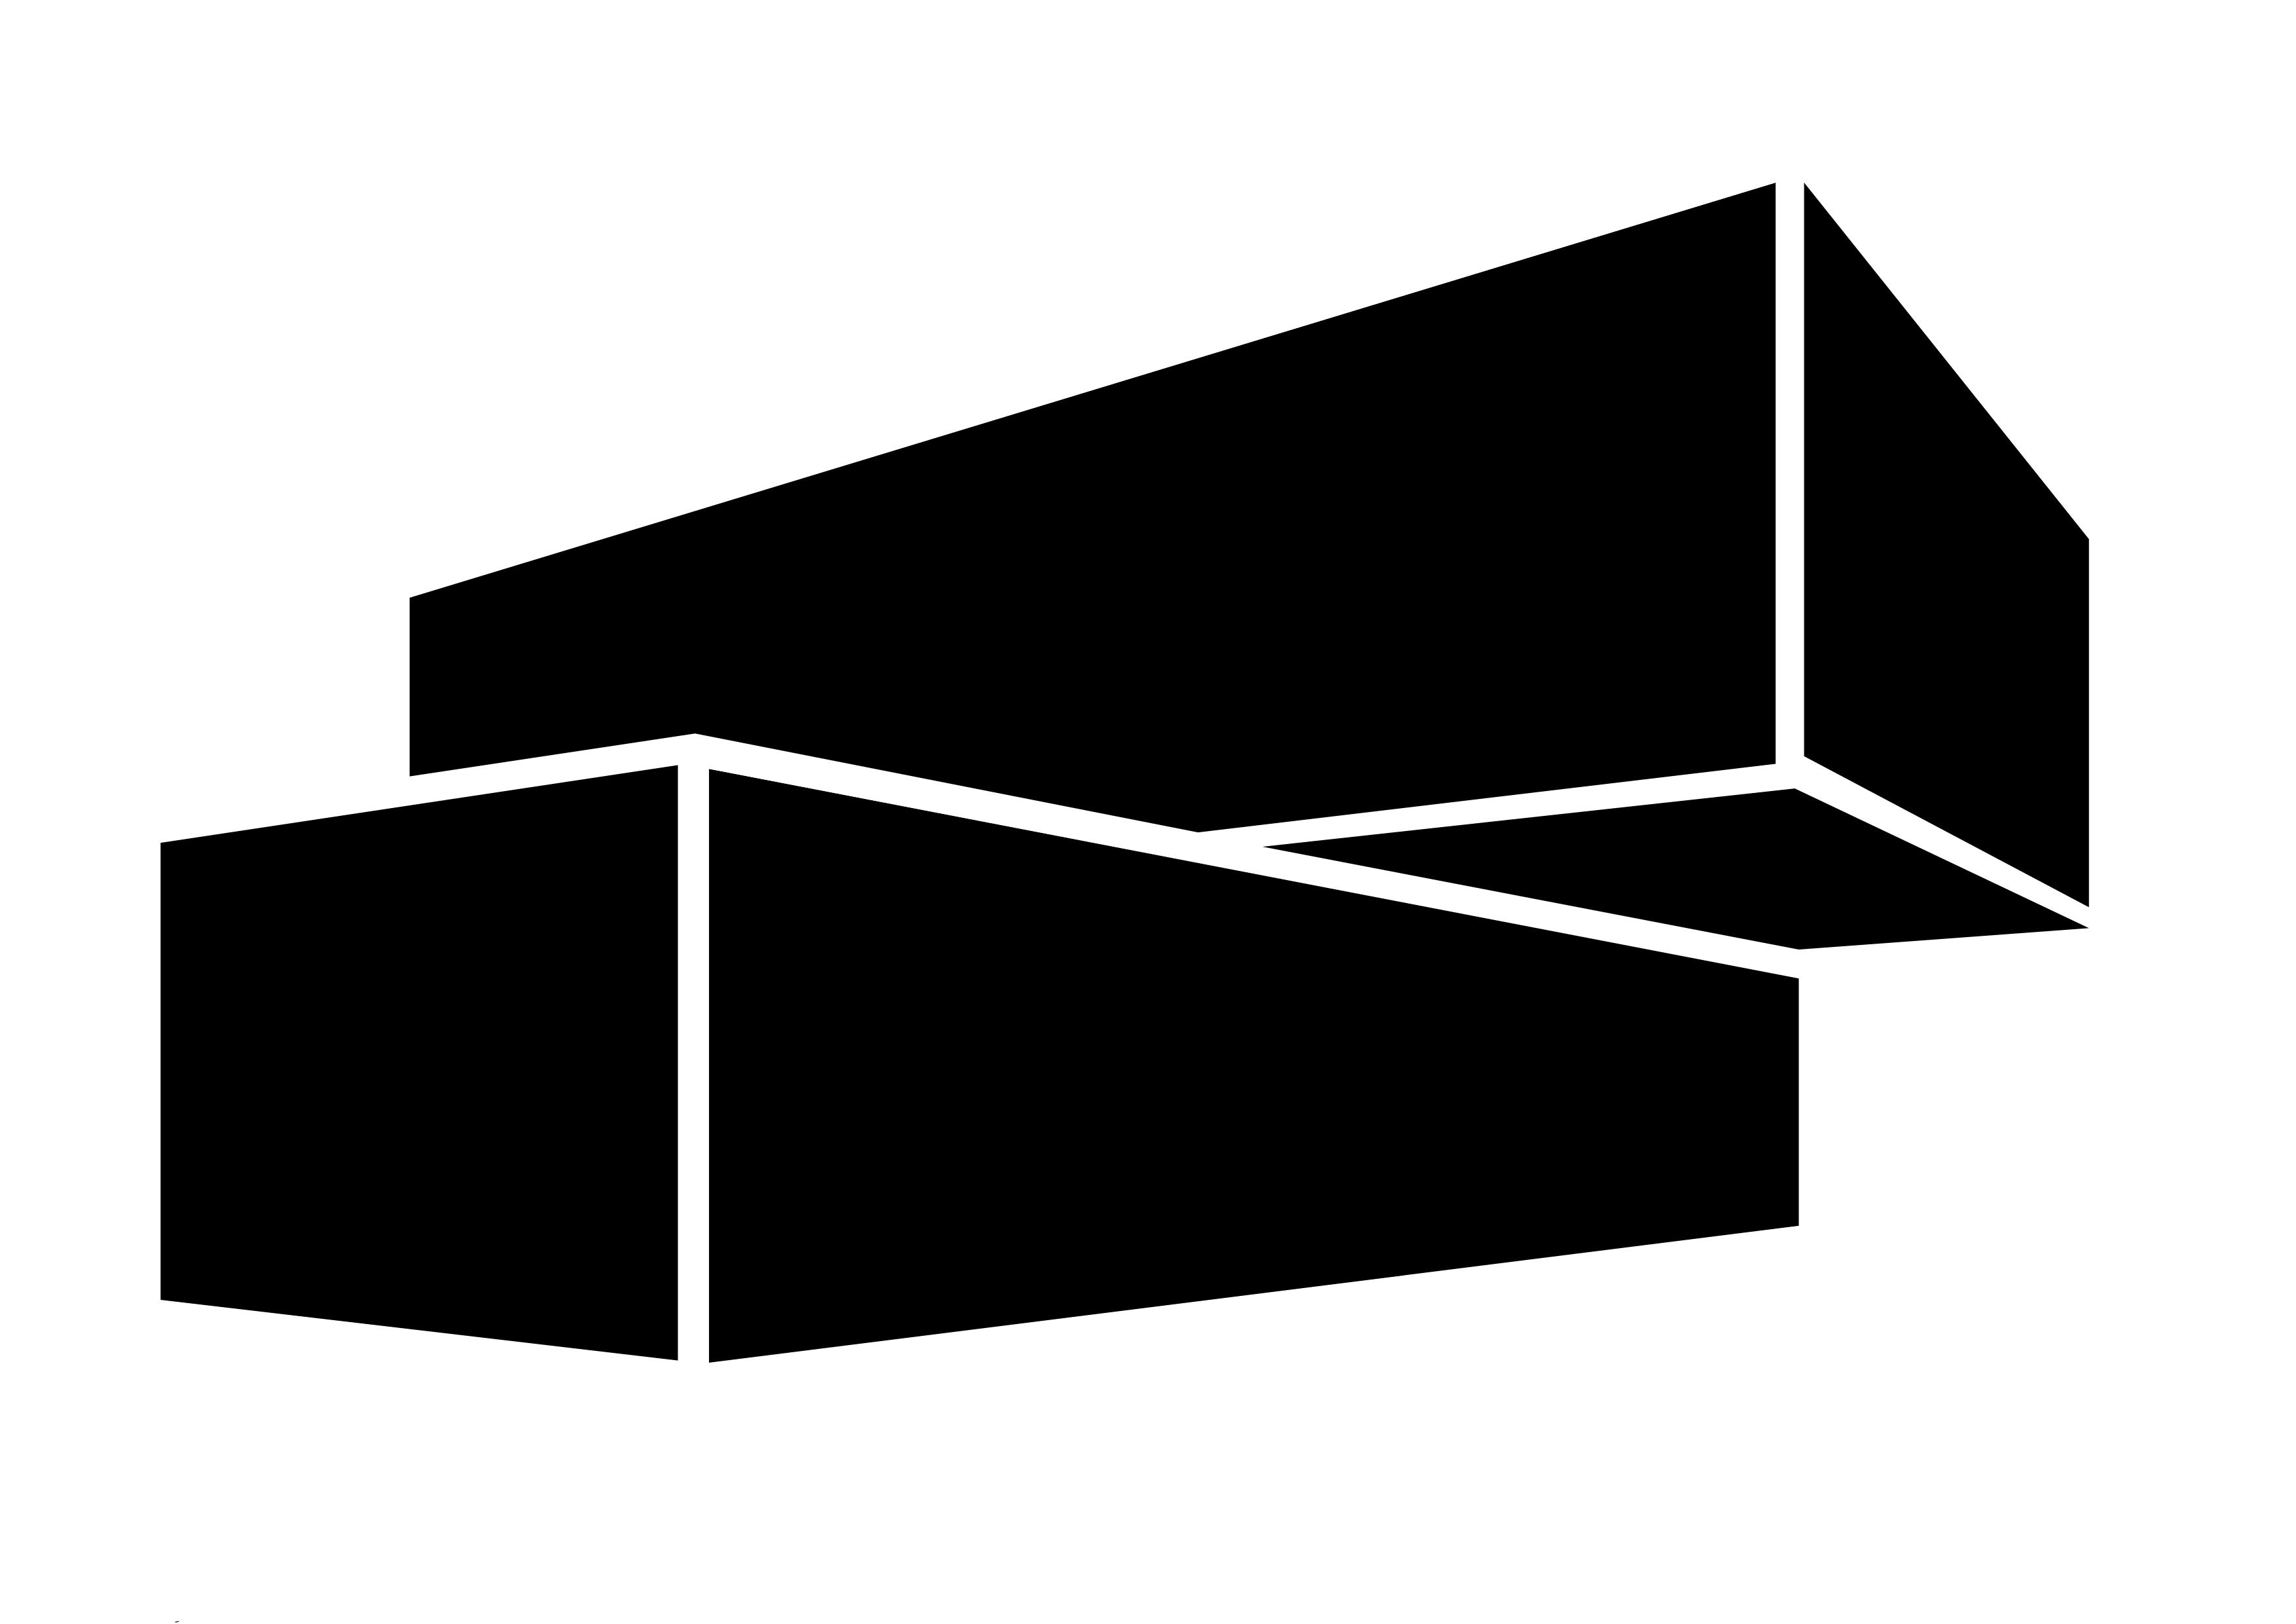 (pt) Projeto de Arquitetura